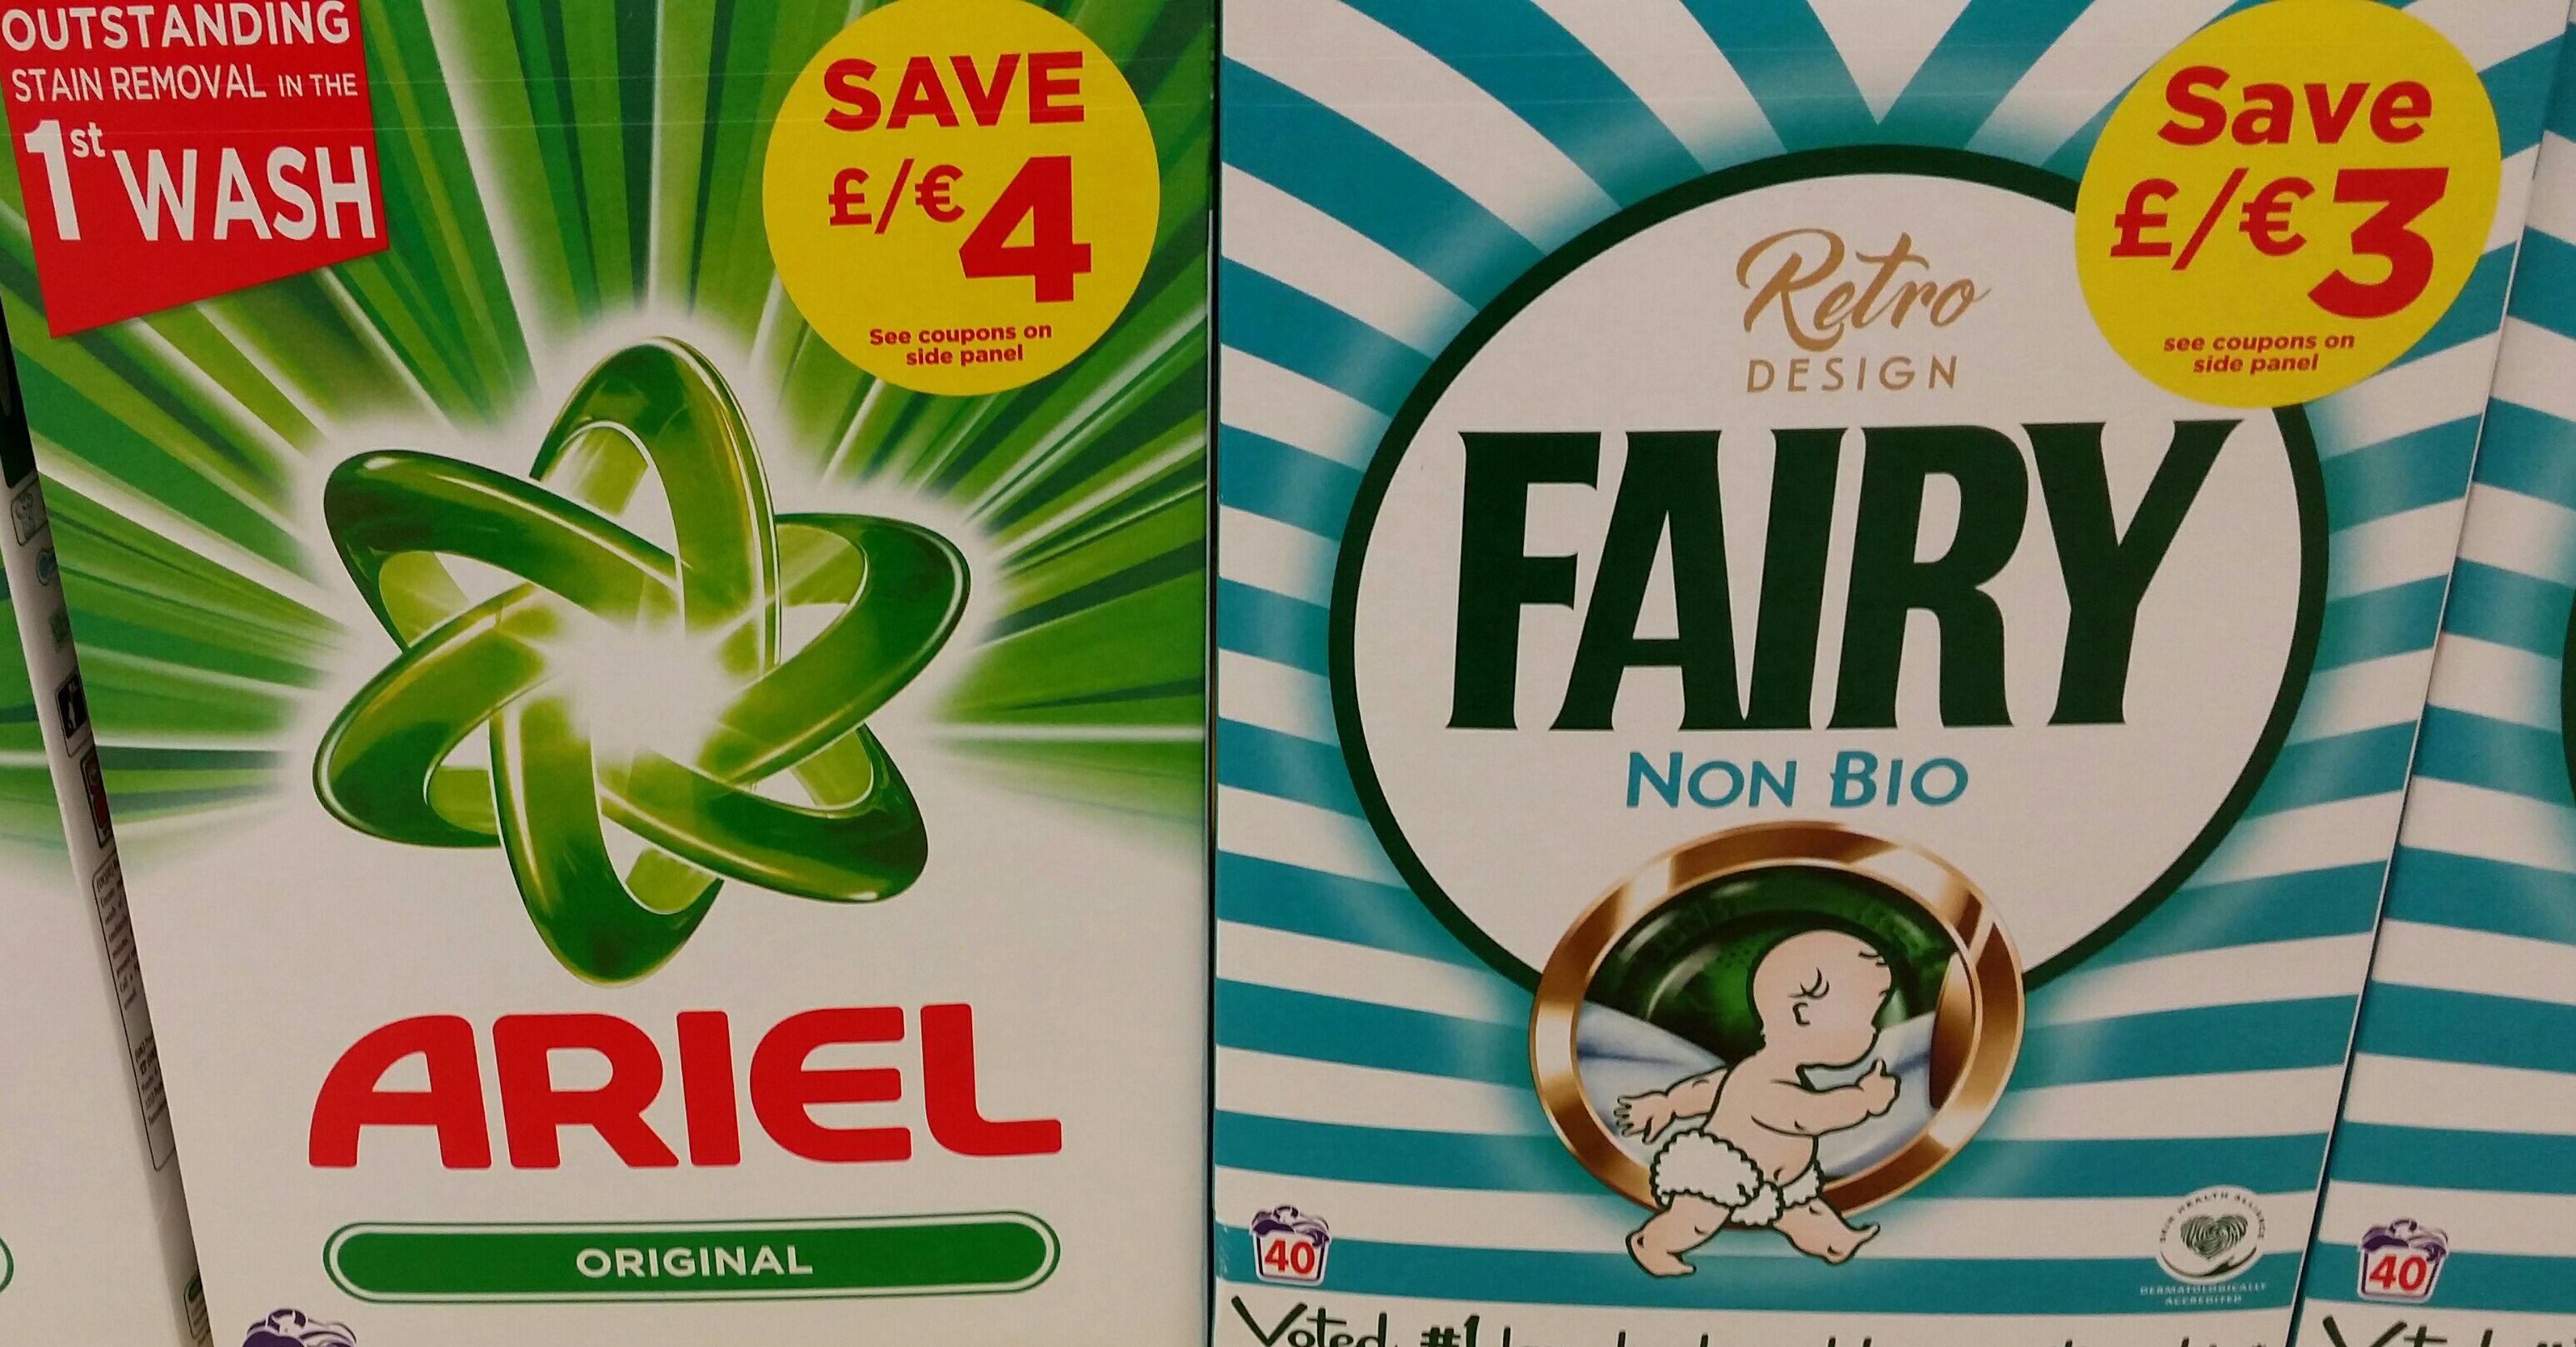 Fairy non bio & Ariel washing powder 40 washes £5 online and instore @ Tesco